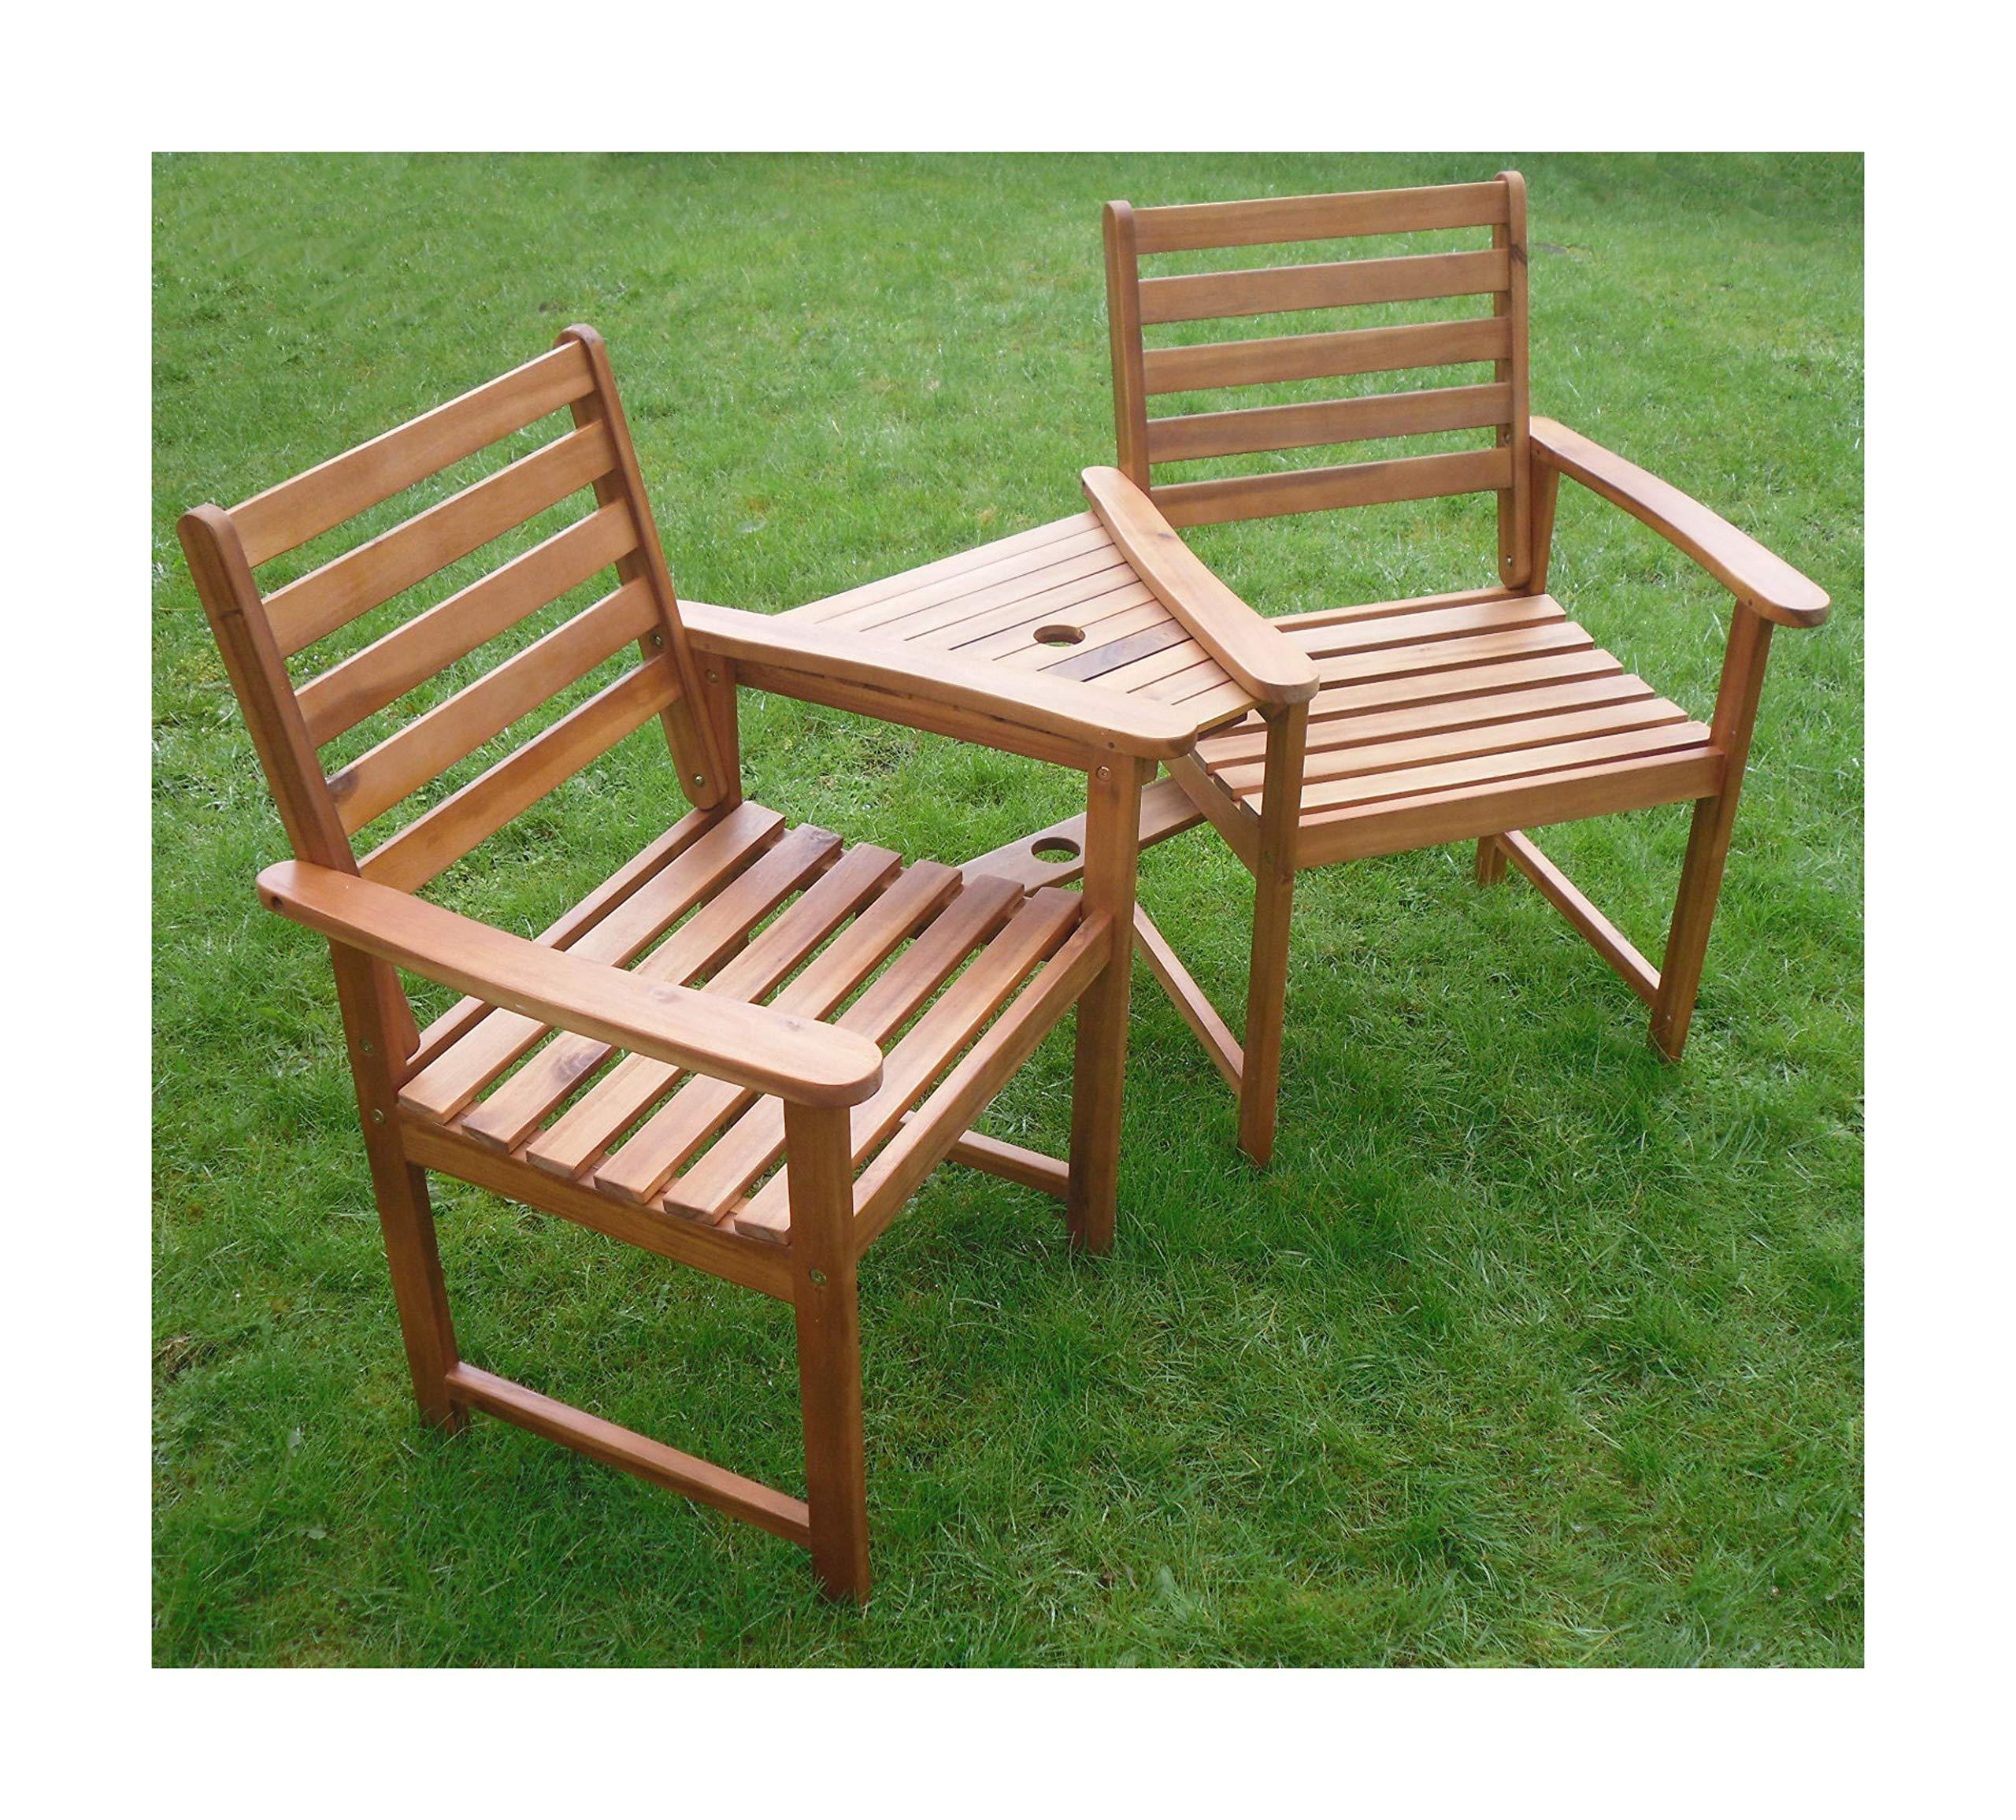 Ascot Hardwood Garden Bench Companion Set Love Seat Great Outdoor Furniture For Your Garden Or Patio Buy Online In Montenegro At Montenegro Desertcart Com Productid 49514085